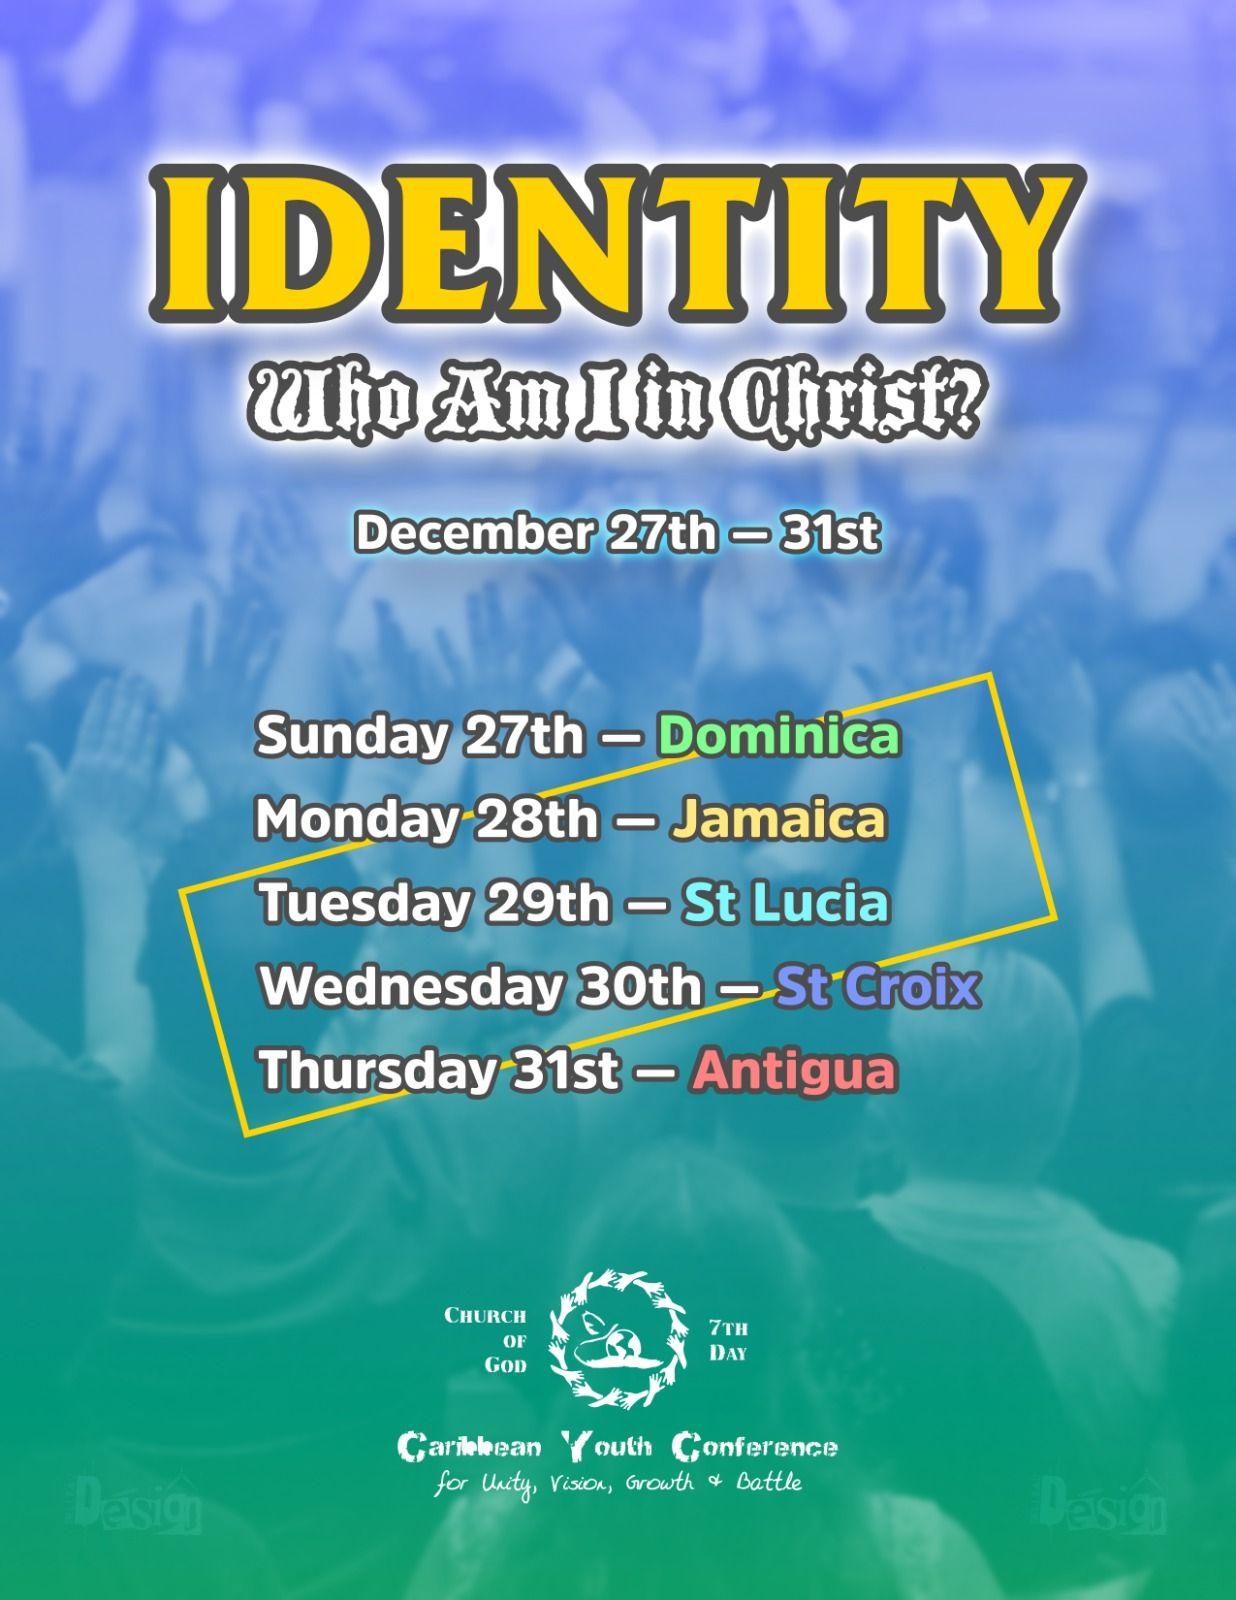 Church of God 7th Day (Dominica) - CYC Virtual Youth Retreat, 27 December 2020